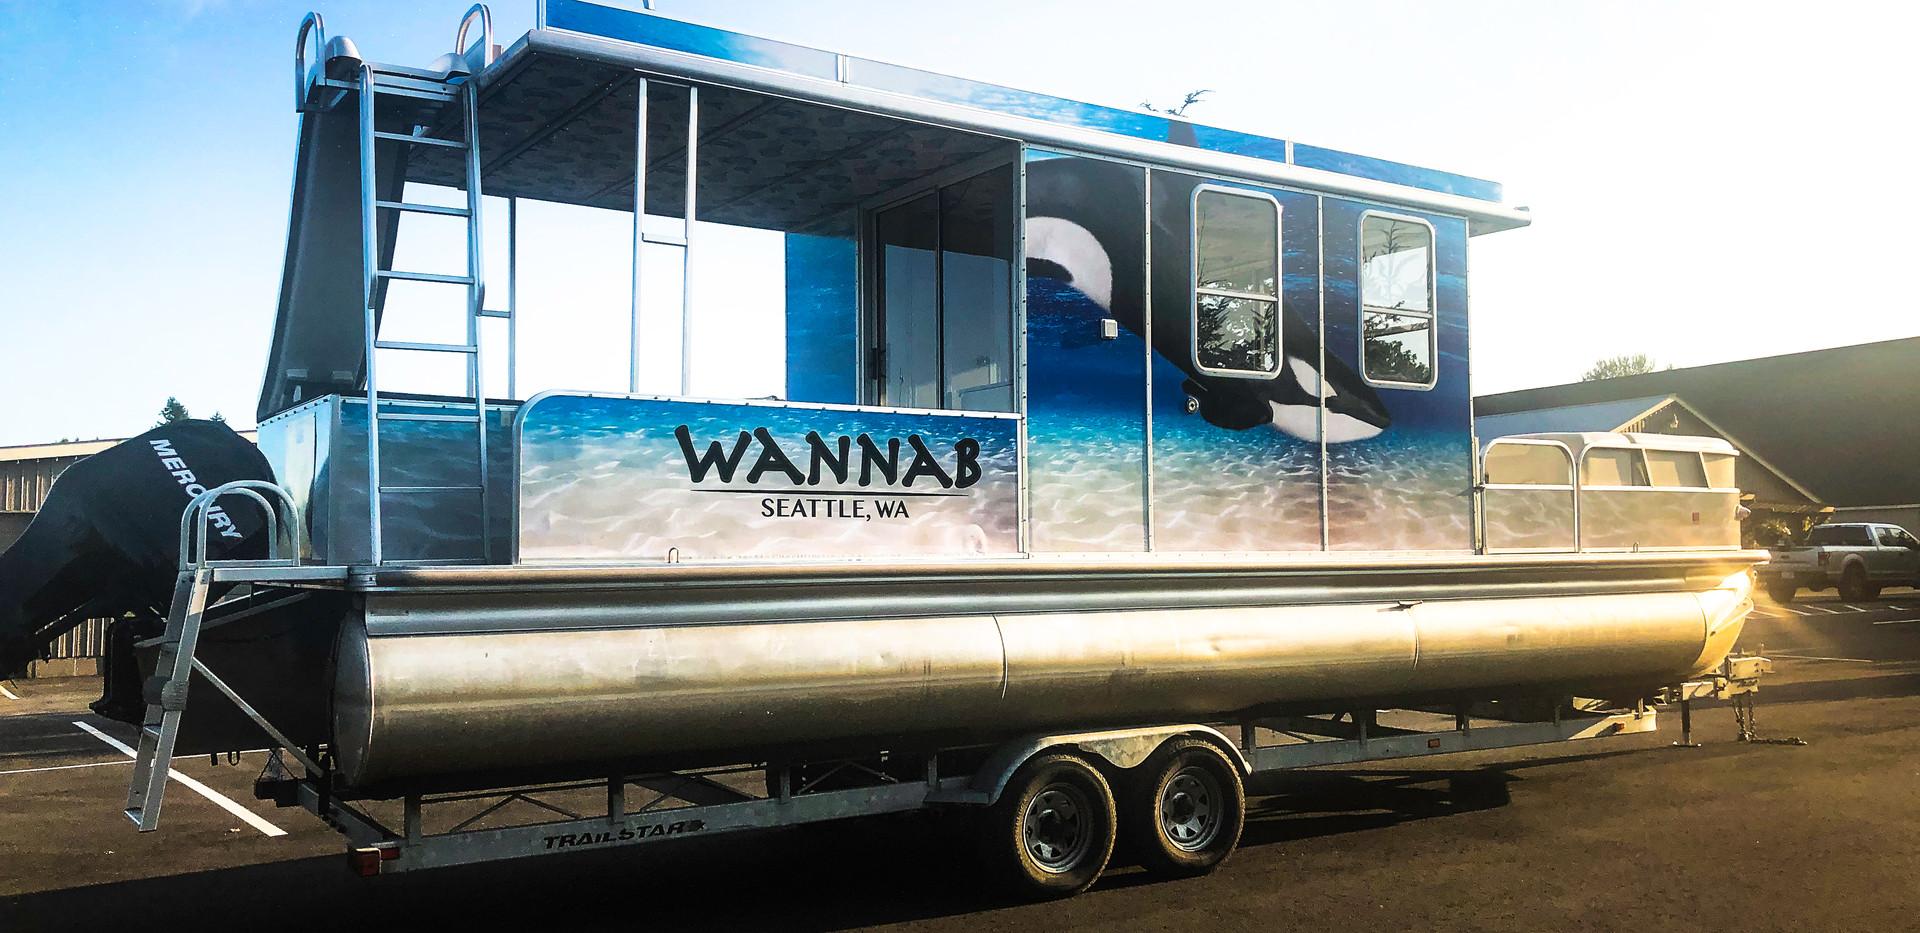 WannaB House Boat